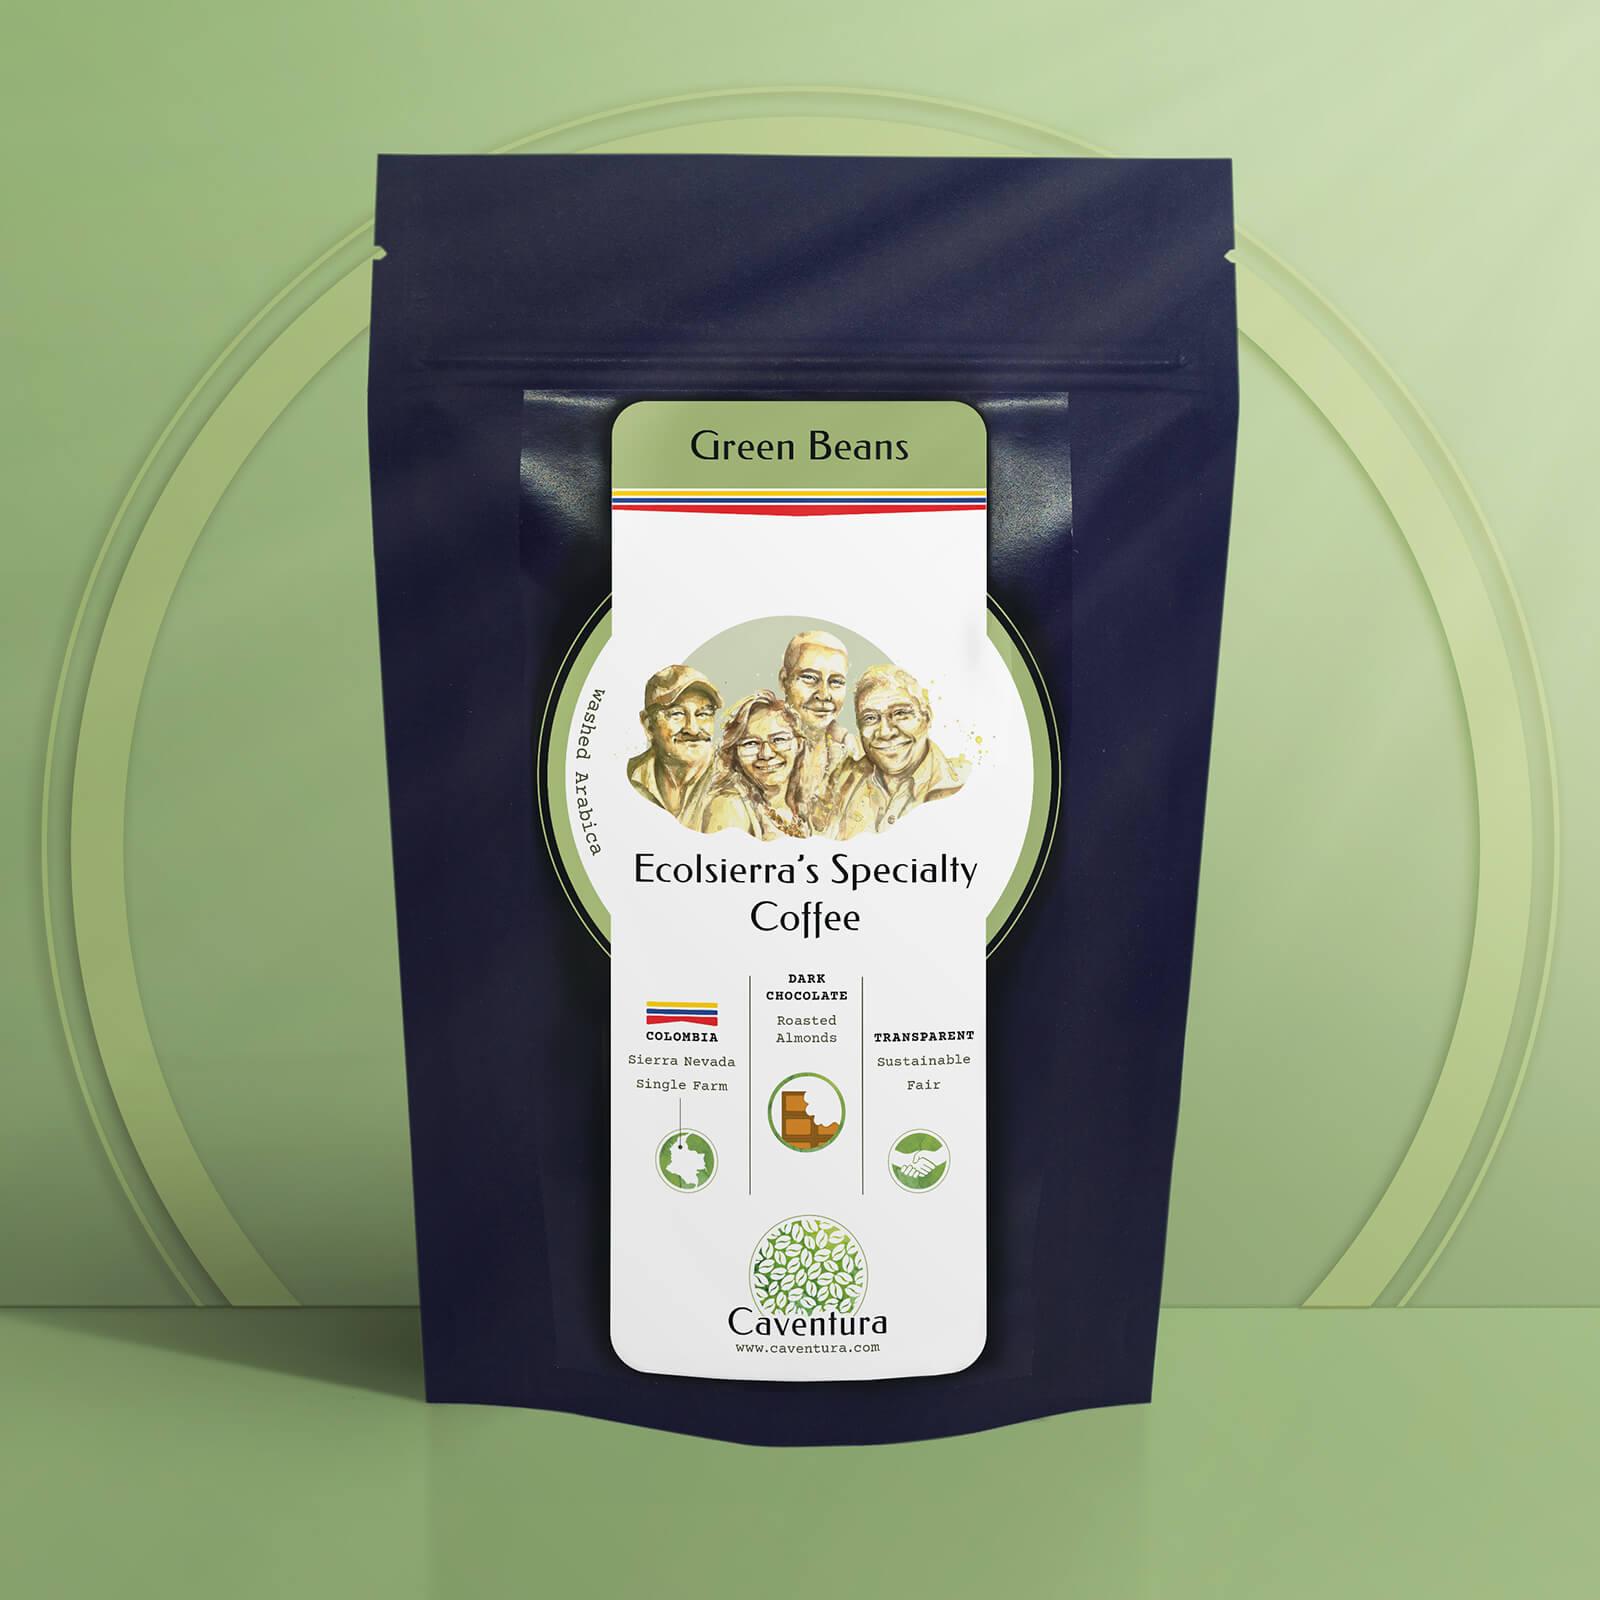 Ecolsierra's Specialty Coffee – Green Beans